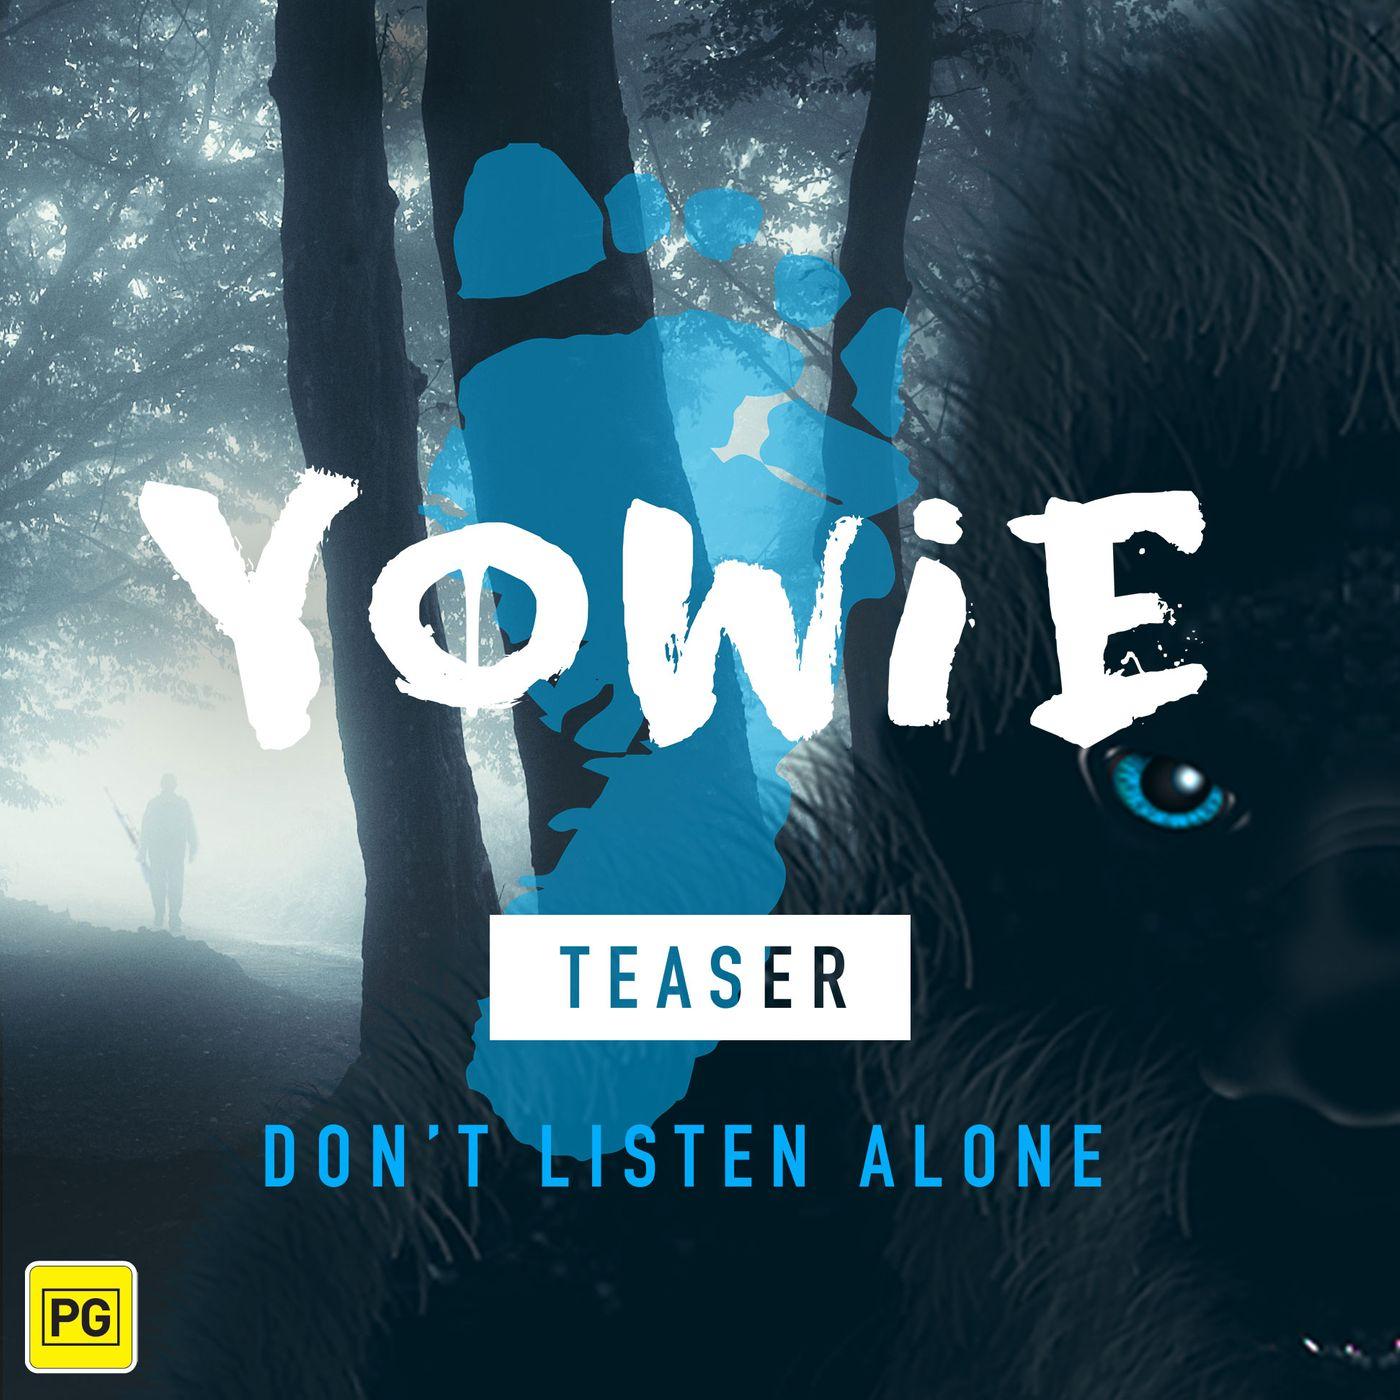 Yowie Teaser